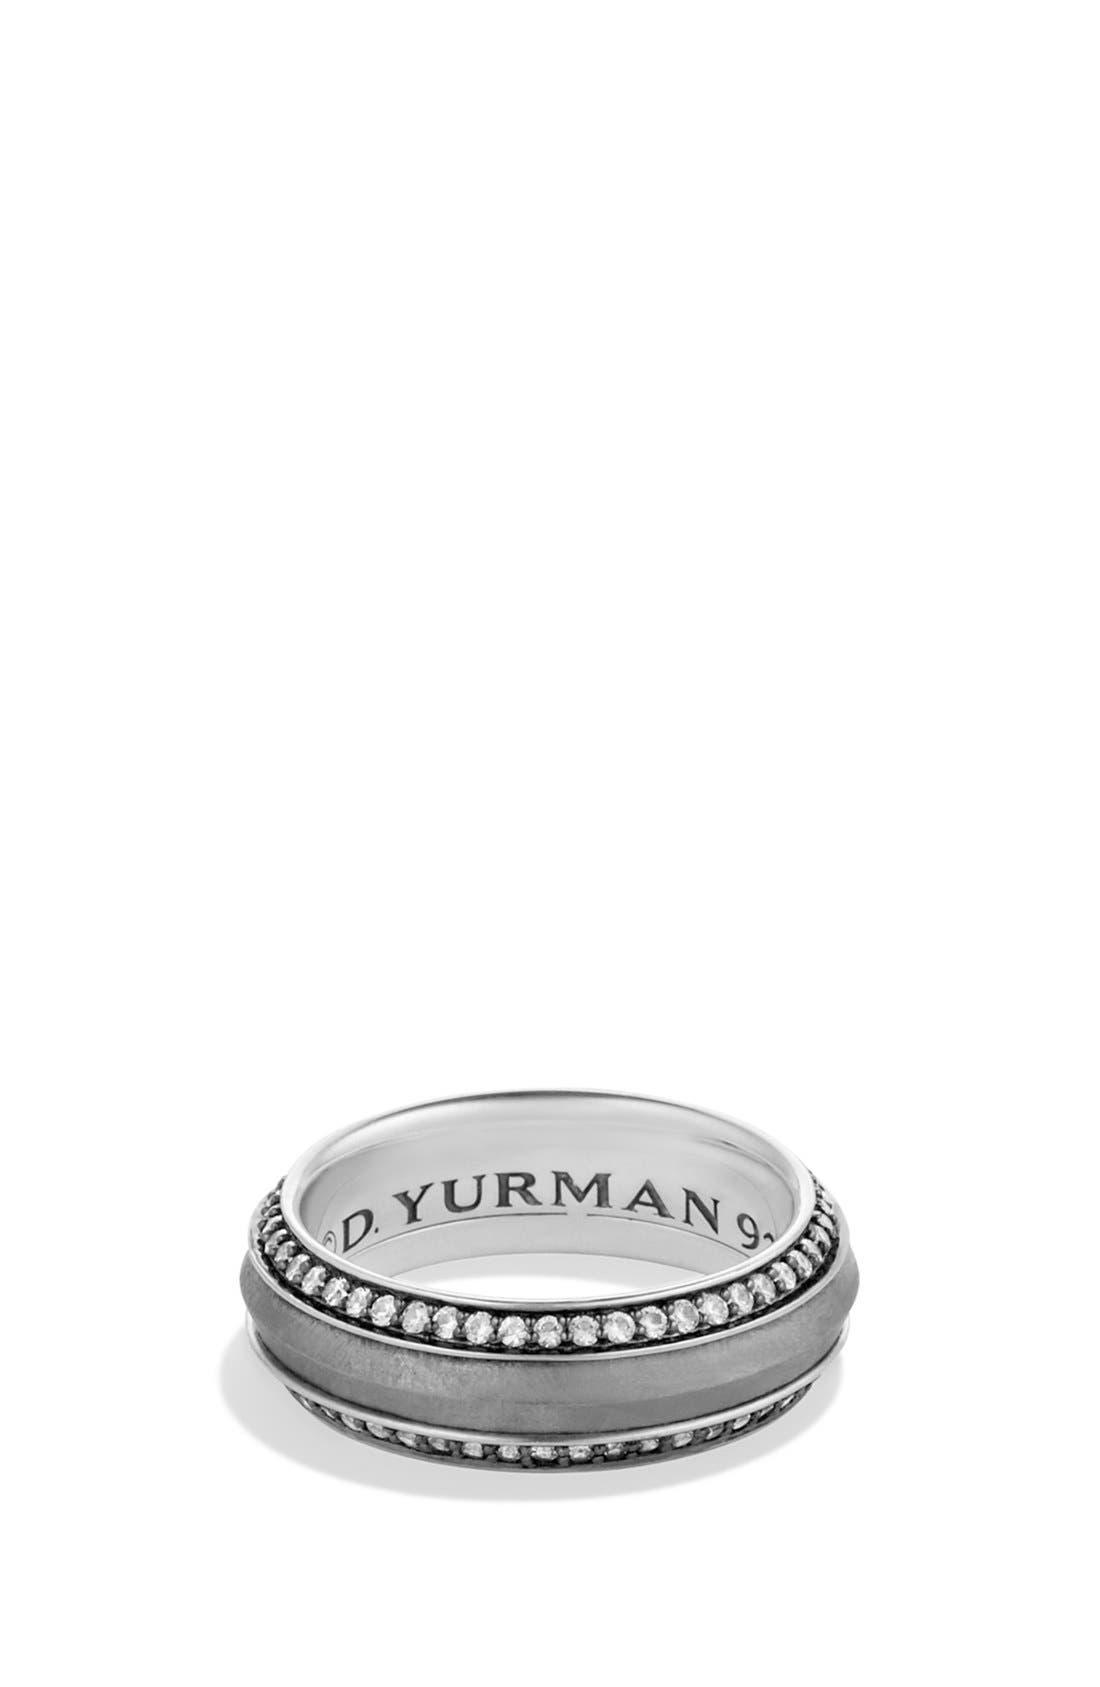 David Yurman 'Meteorite' Knife-Edge Band Ring with Grey Sapphires